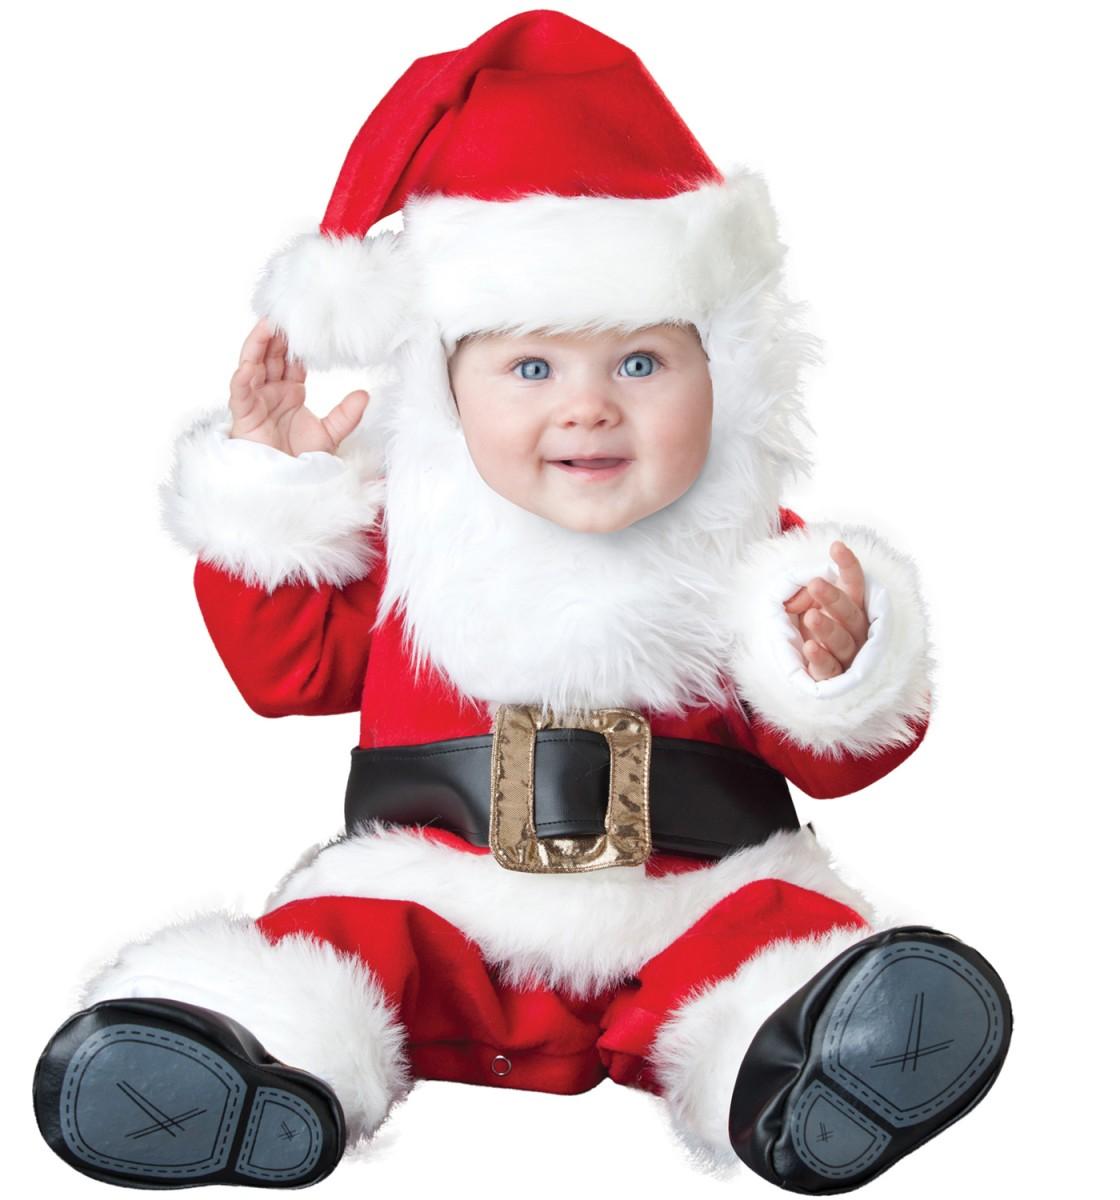 Новогодний детский костюм картинки